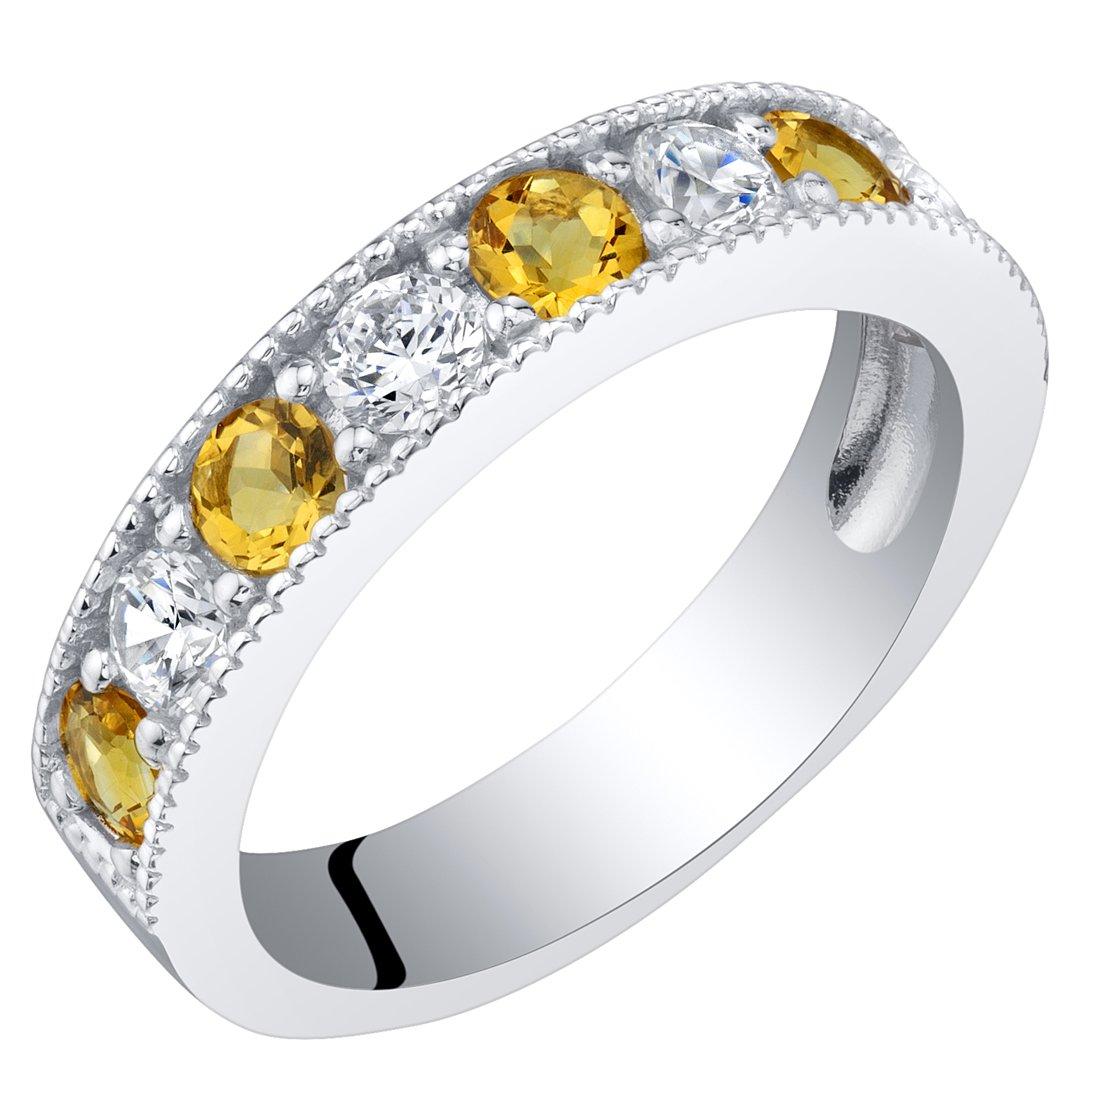 Sterling Silver Citrine Milgrain Half Eternity Ring Band Size 9